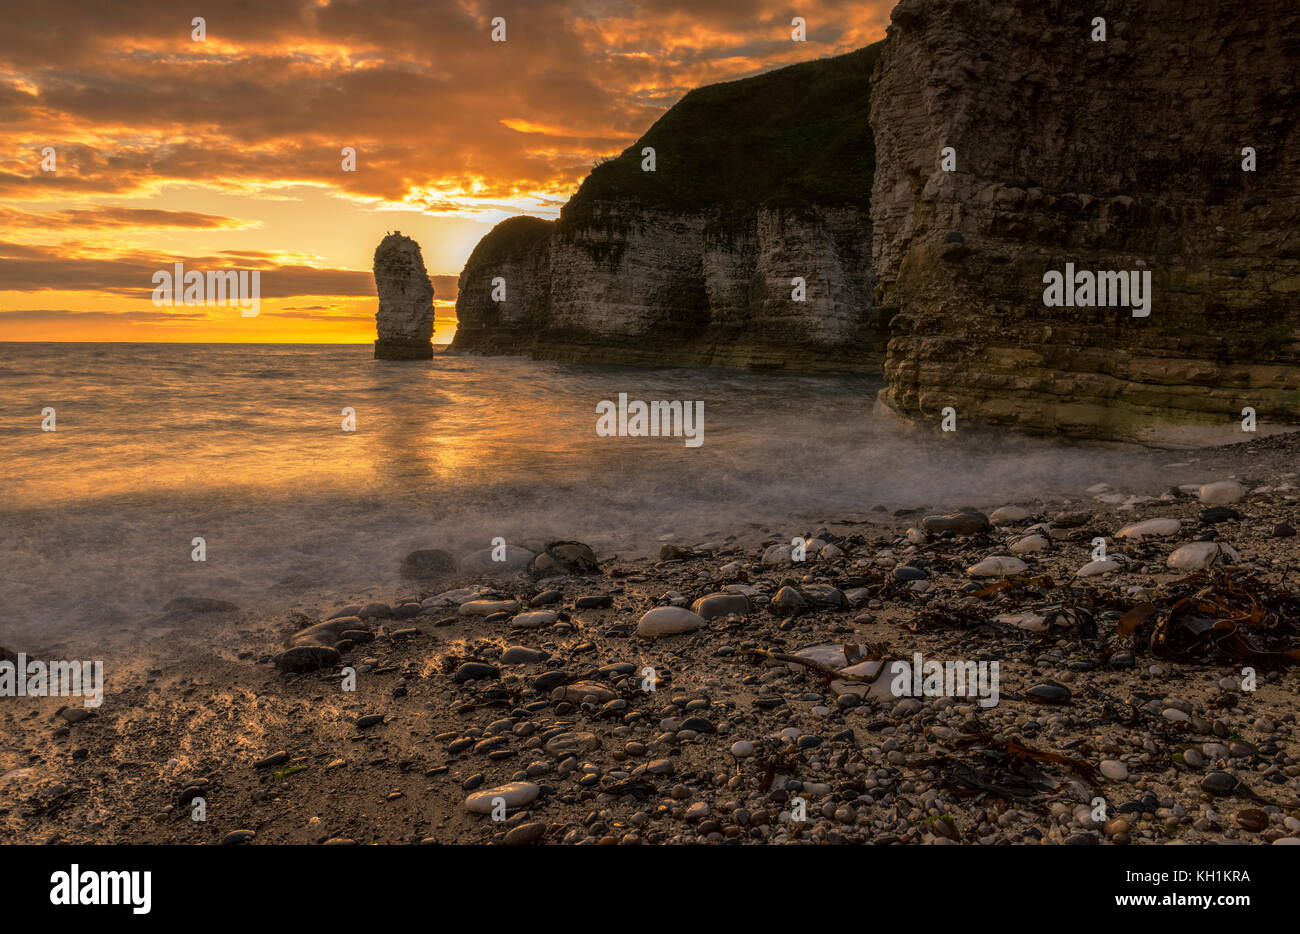 coastal sunrise on a pebble beach - Stock Image